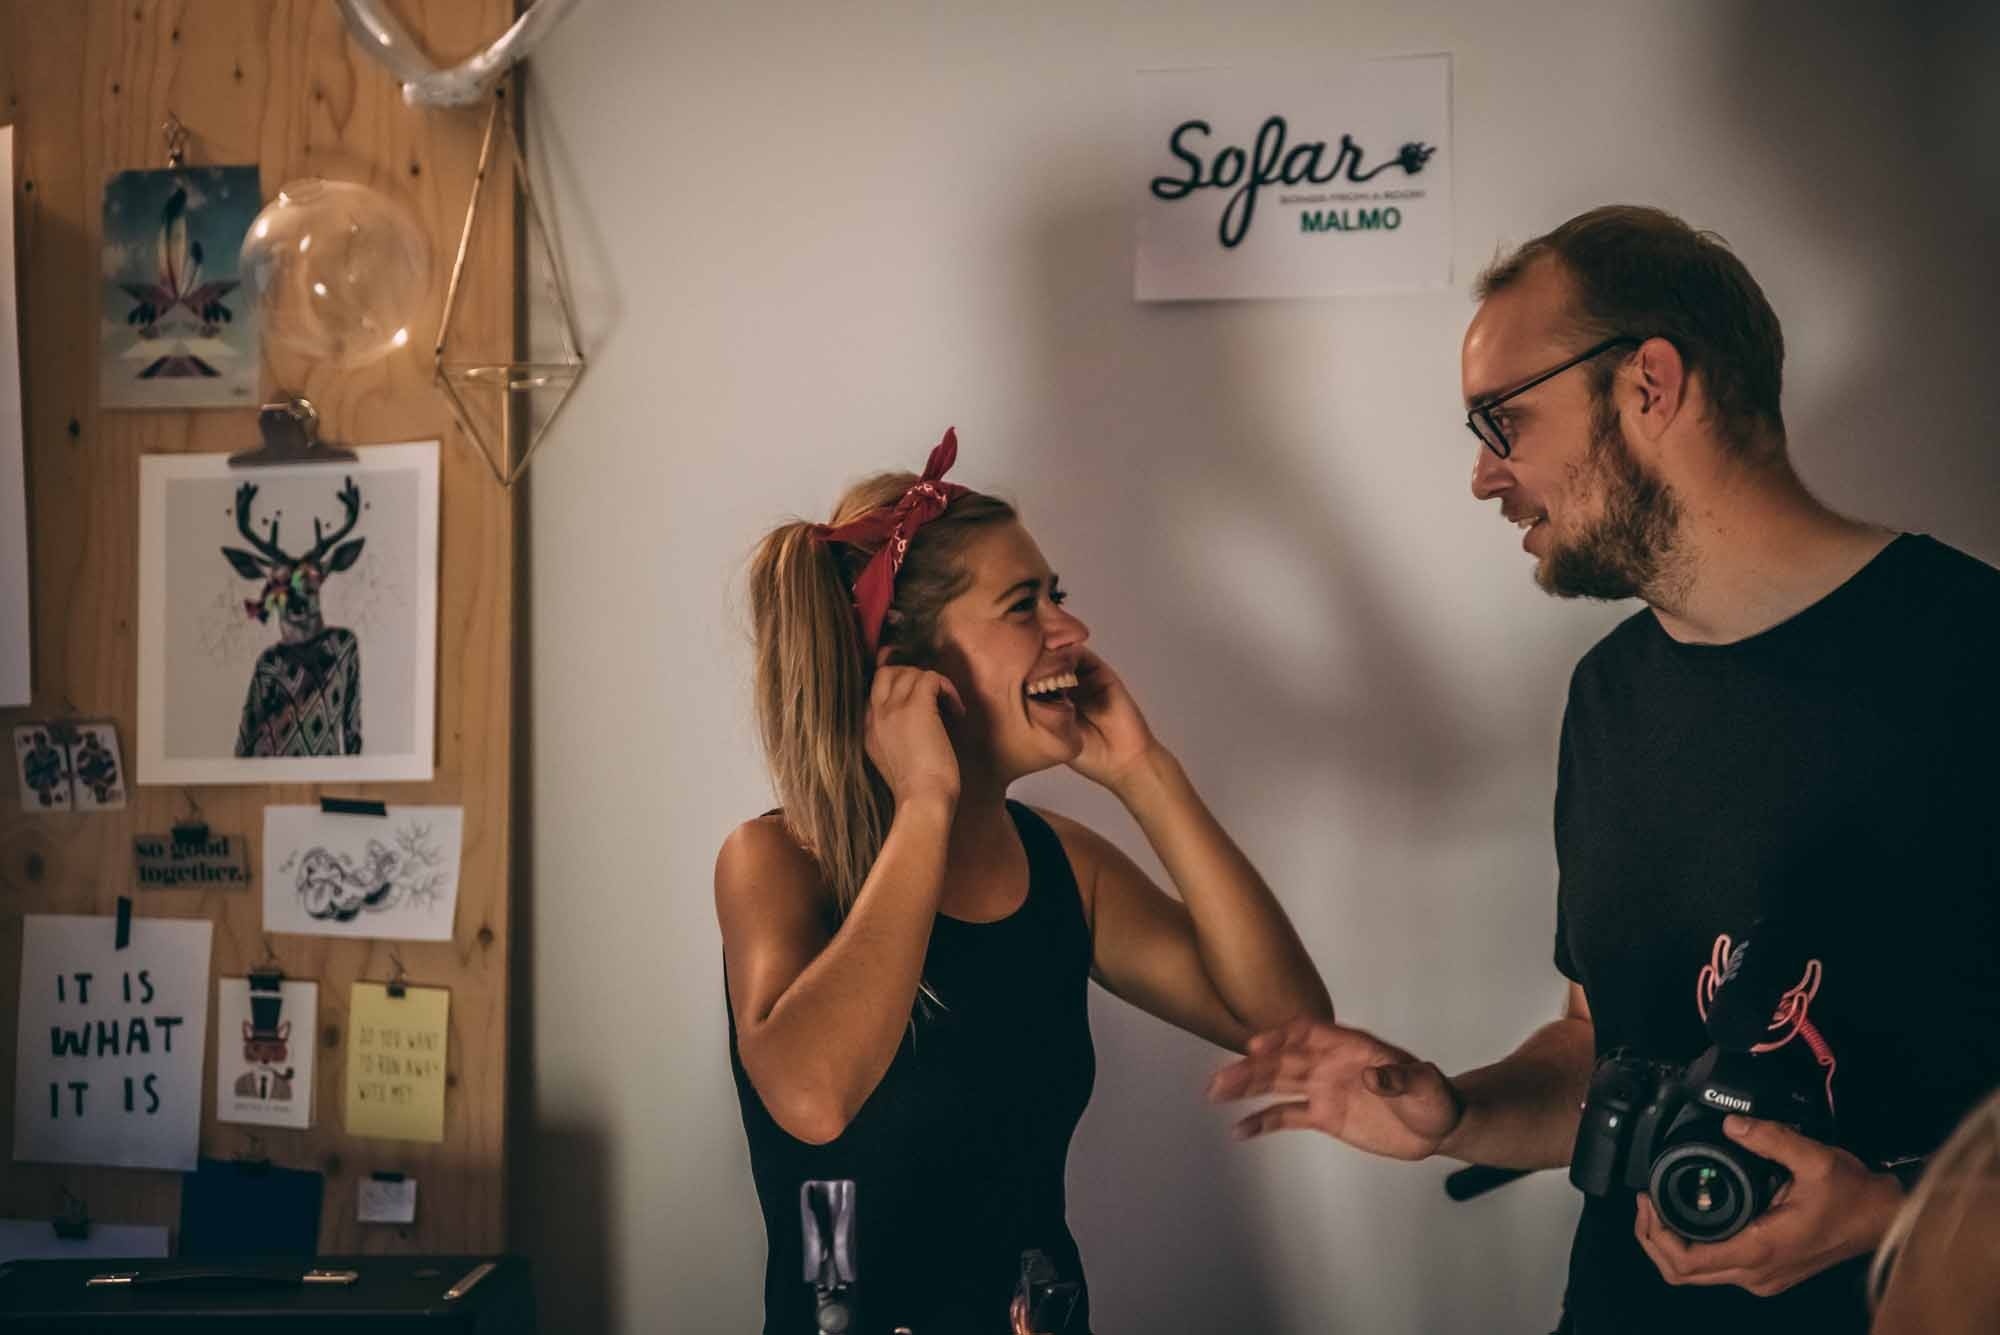 2018 - August - Sofia Landgren, Torsi, Windows & Stones